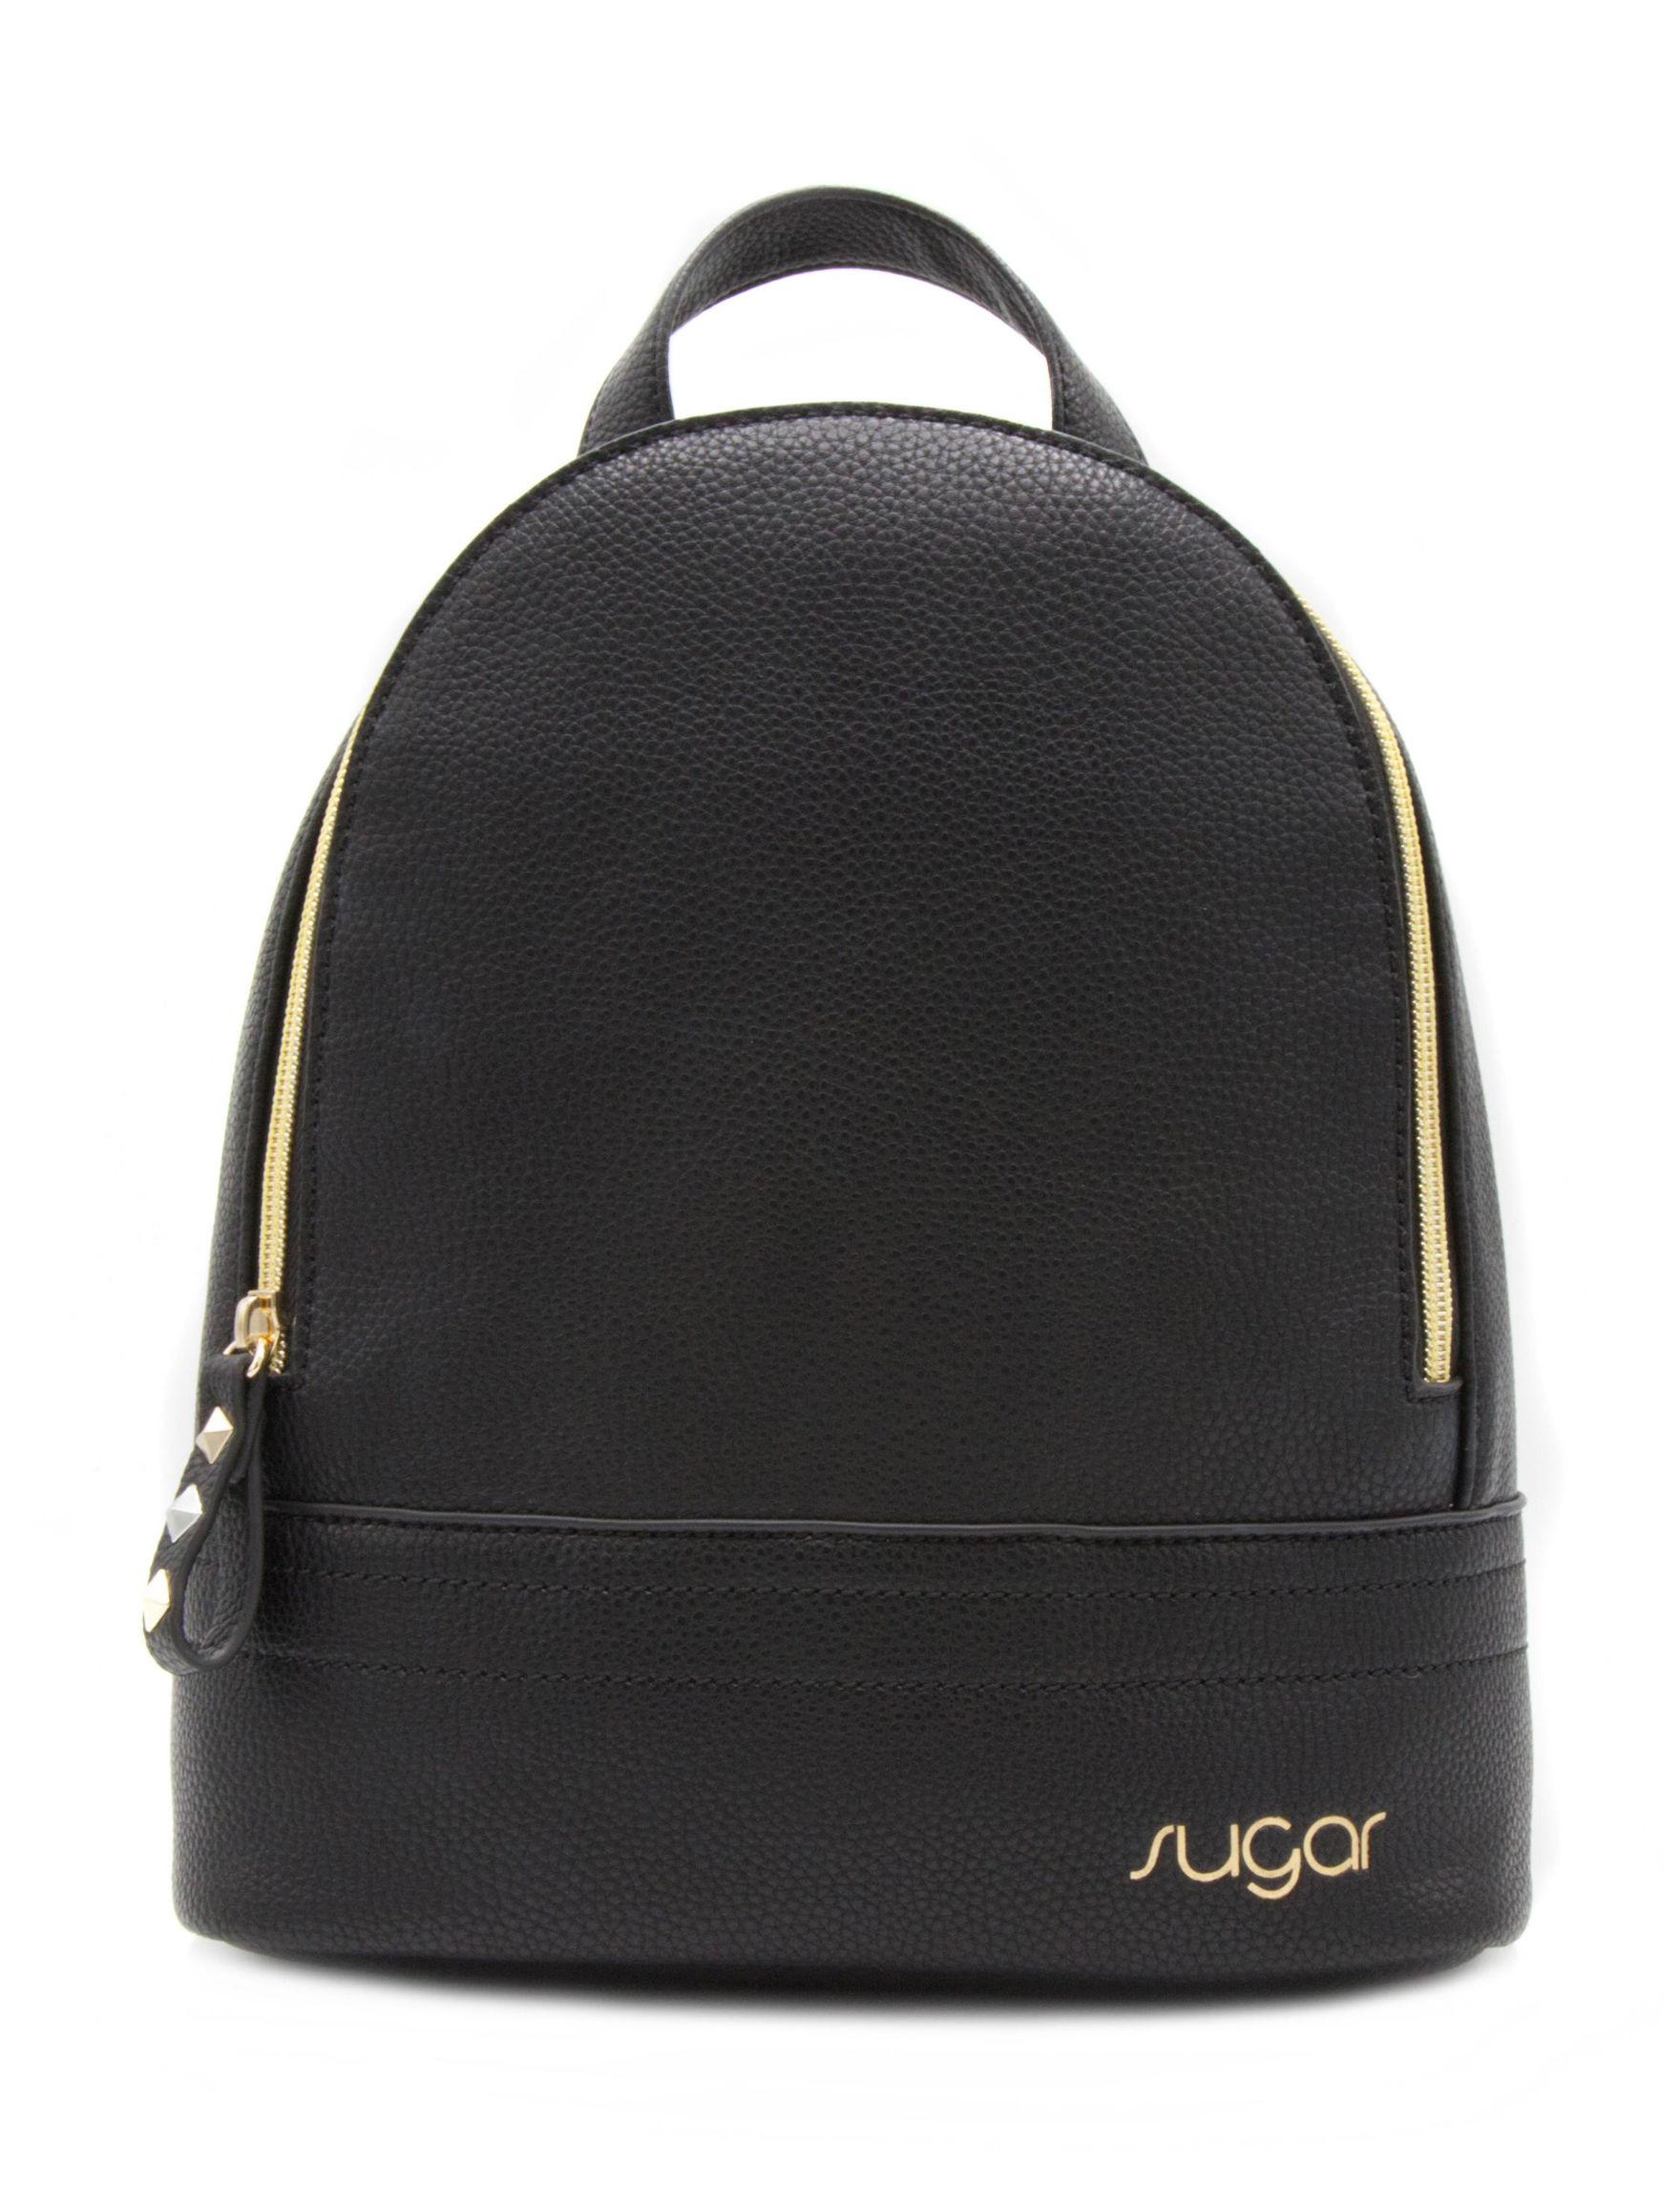 Sugar Black Bookbags & Backpacks